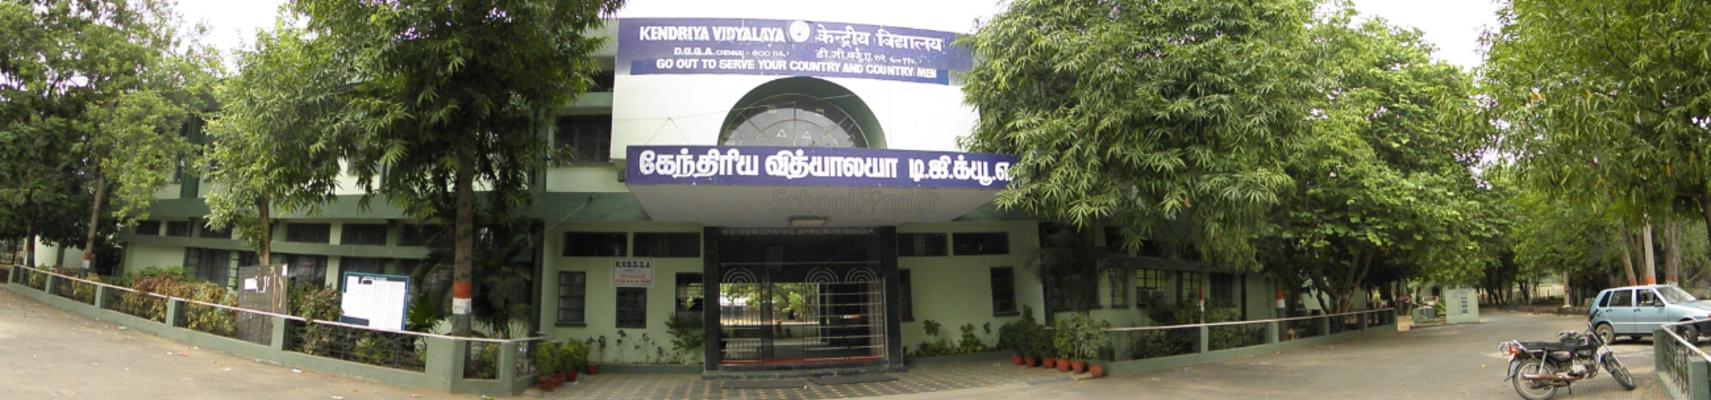 Kendriya Vidyalaya Pazhavanthangal - cover